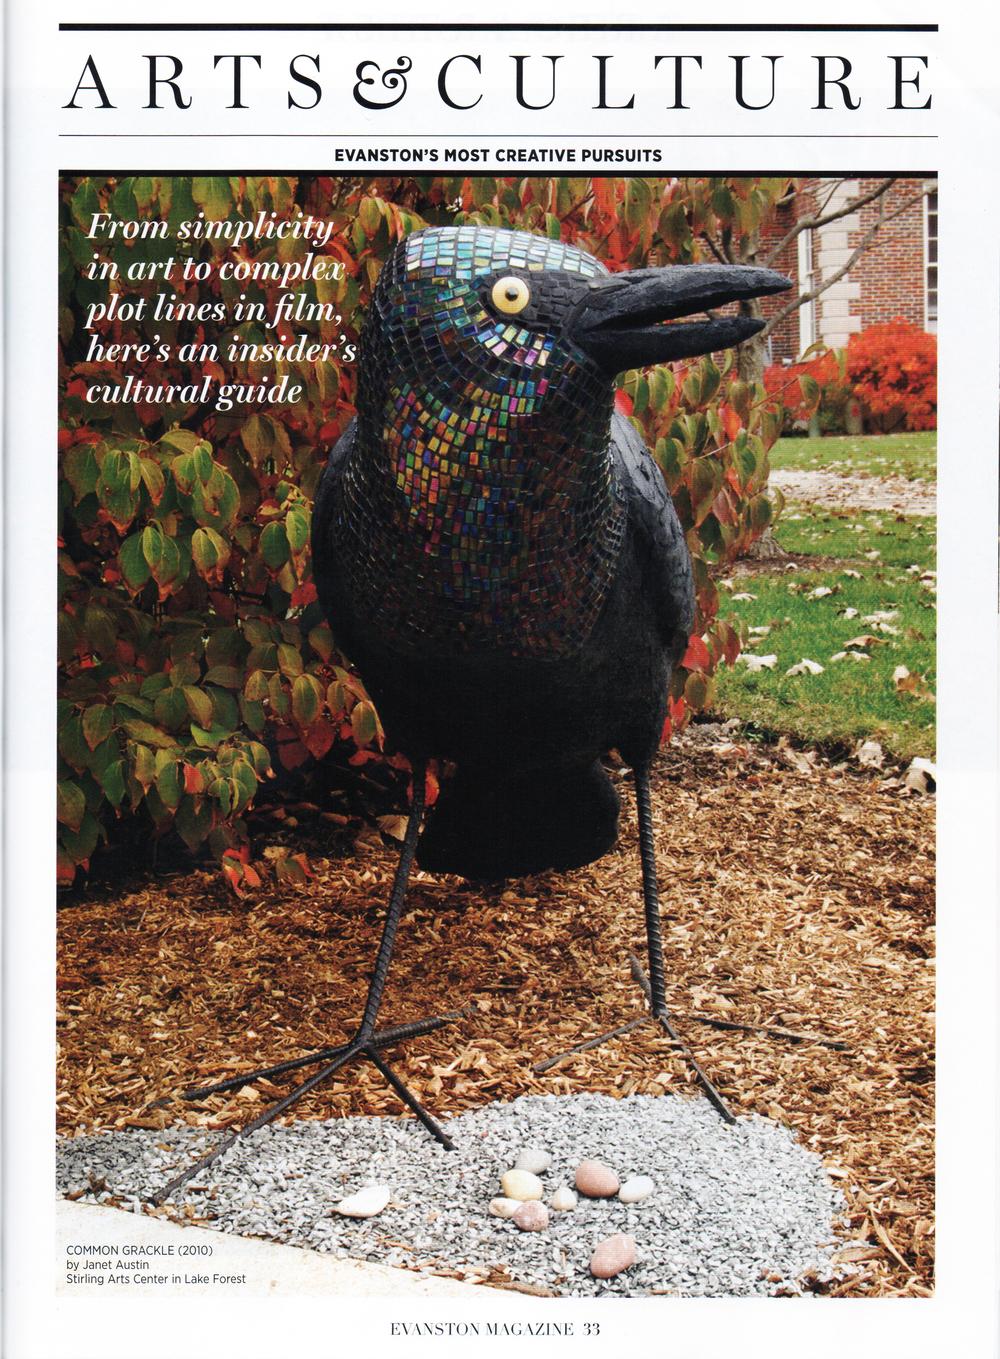 Evanston magazine cover